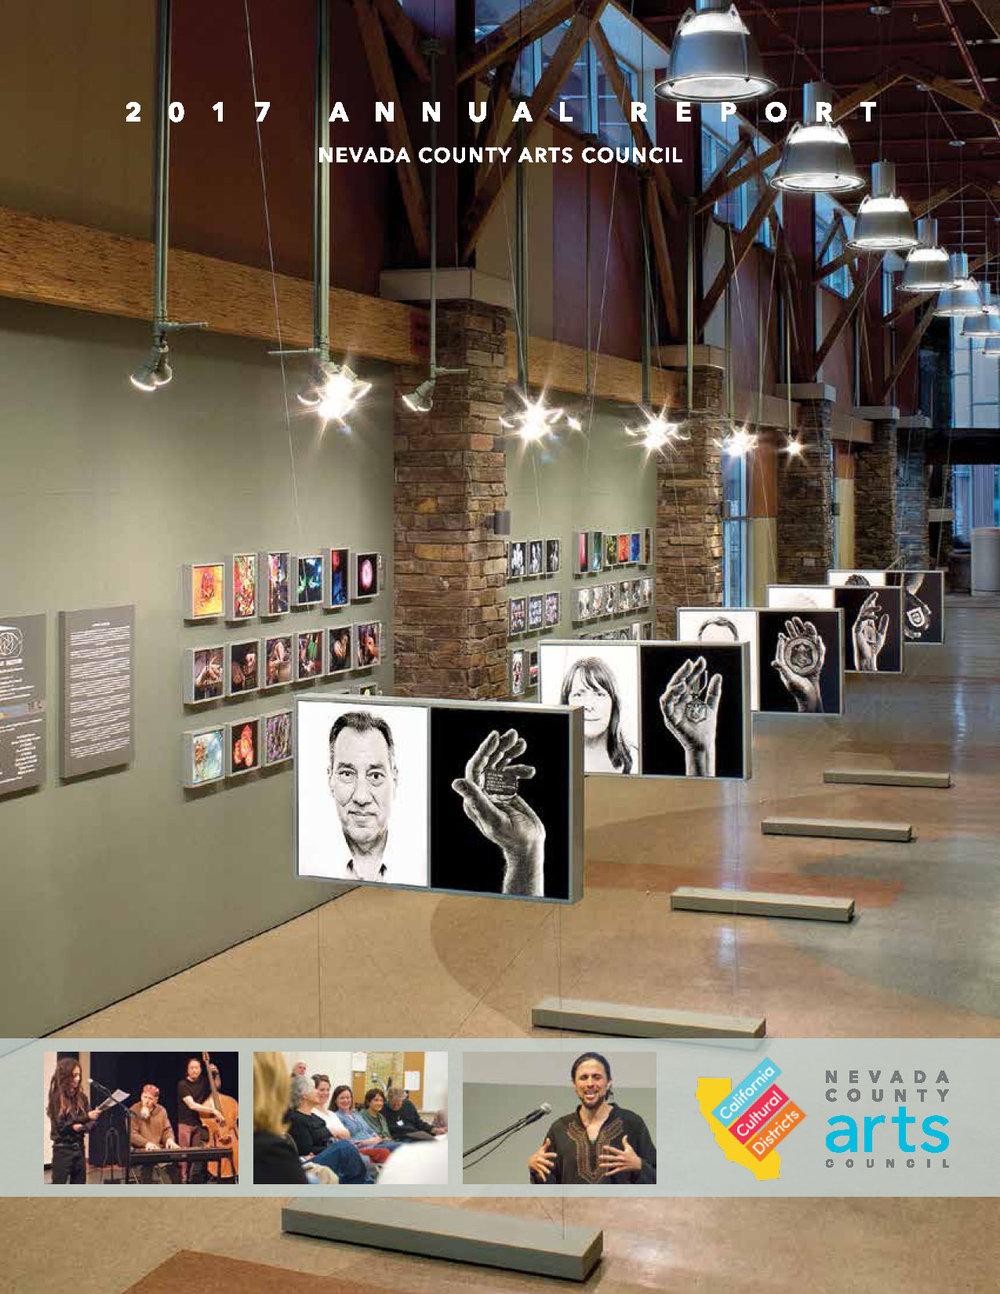 FINAL Annual Report 2017 copy 1.jpg